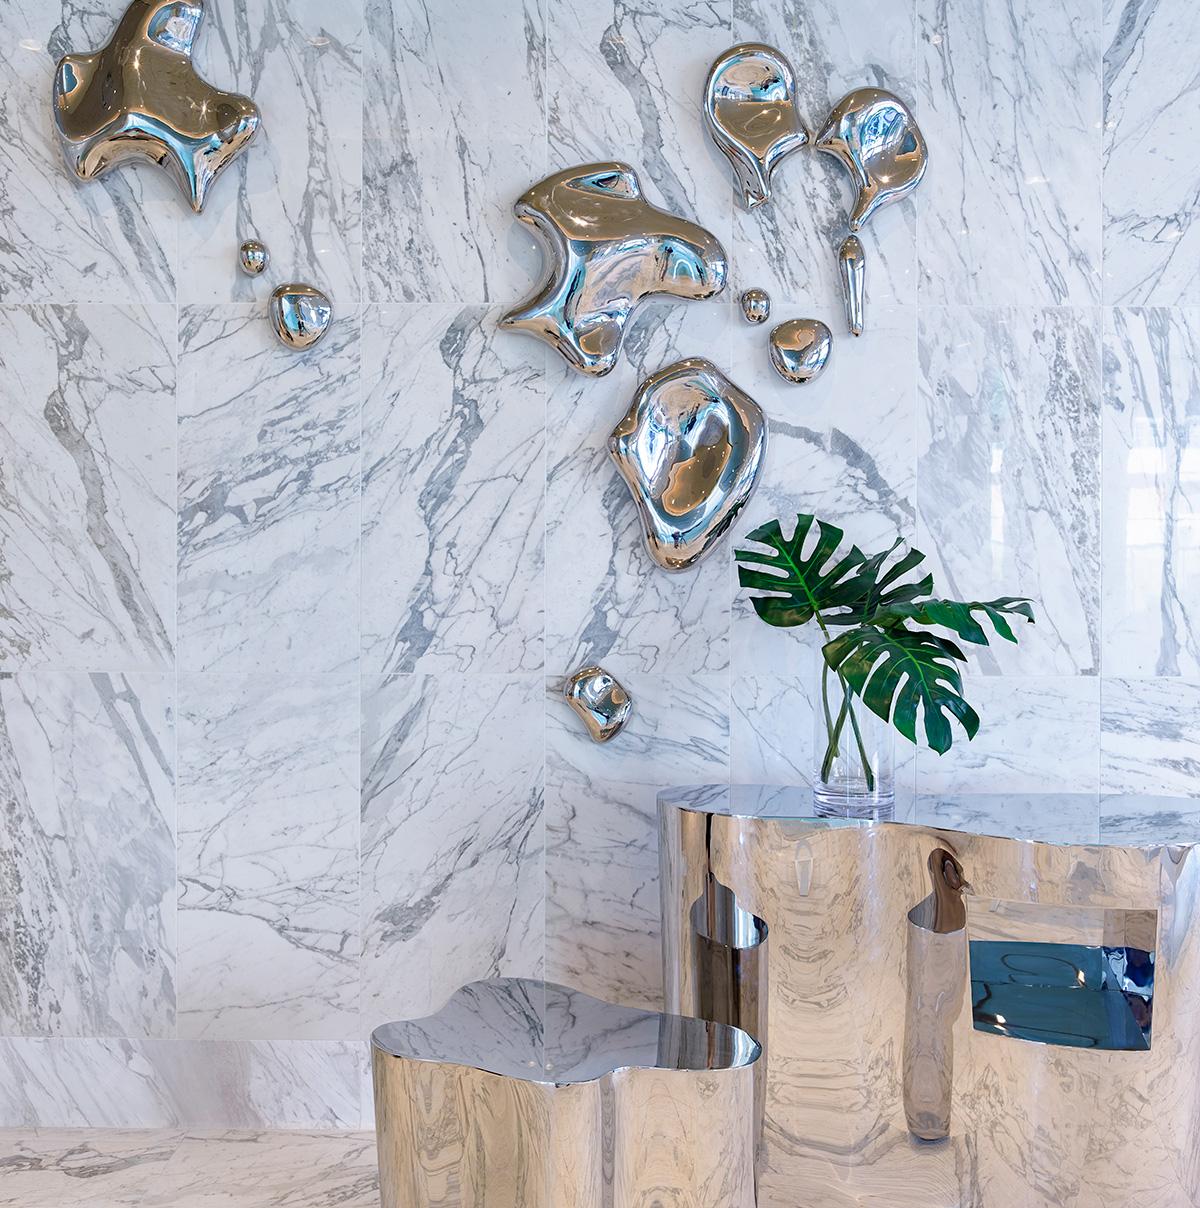 5 Lavish Projects By Studio Munge